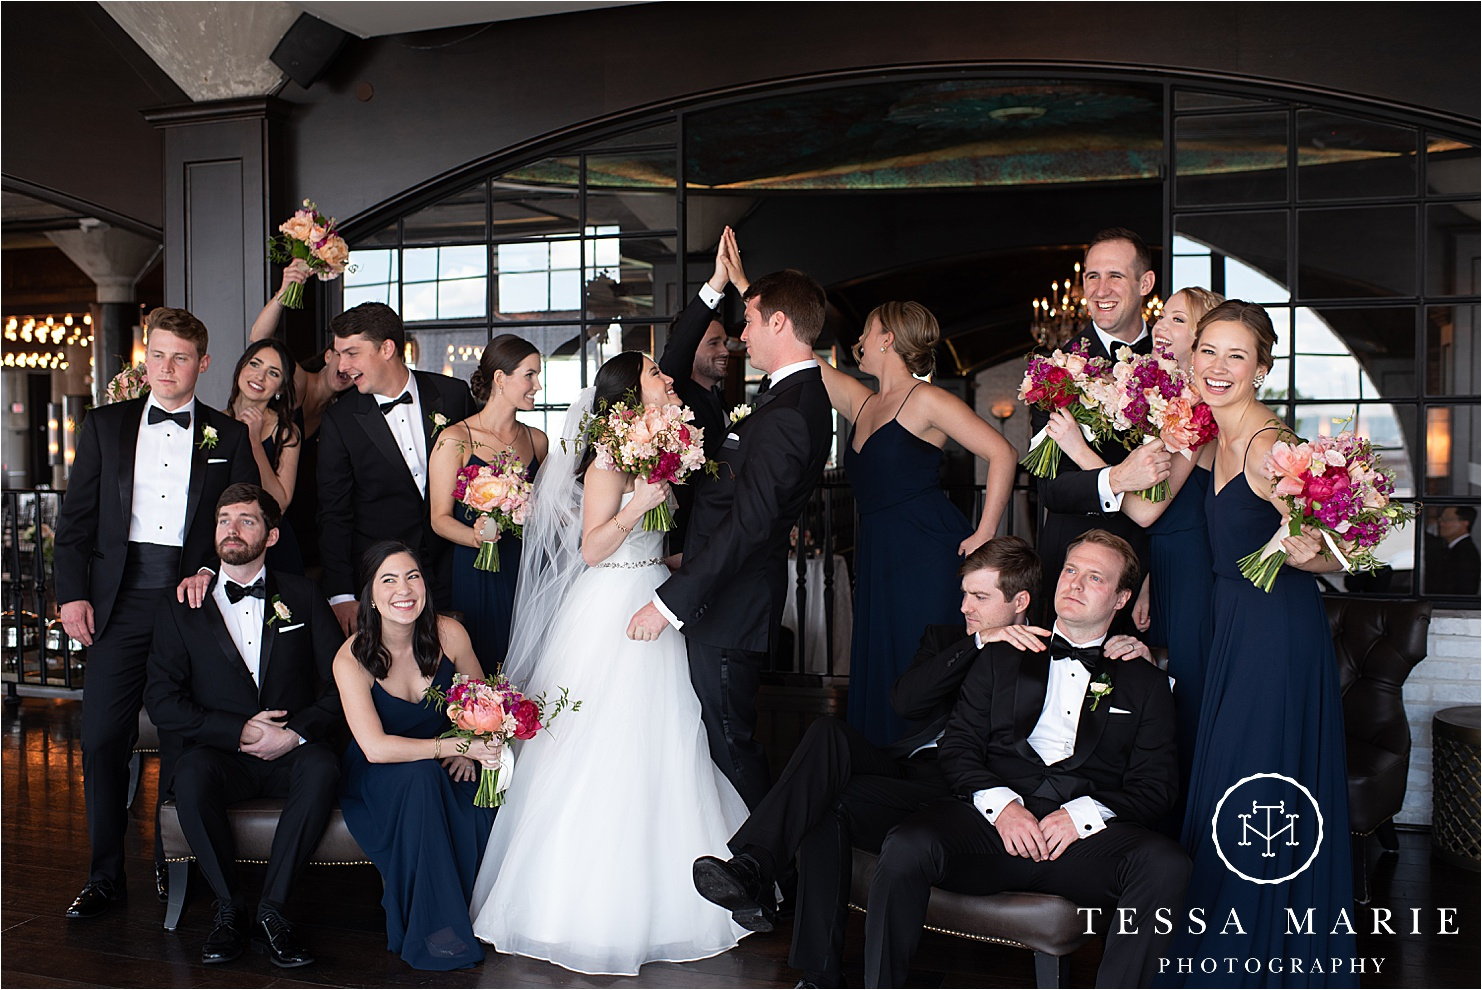 Tessa_marie_weddings_houston_wedding_photographer_The_astorian_0086.jpg